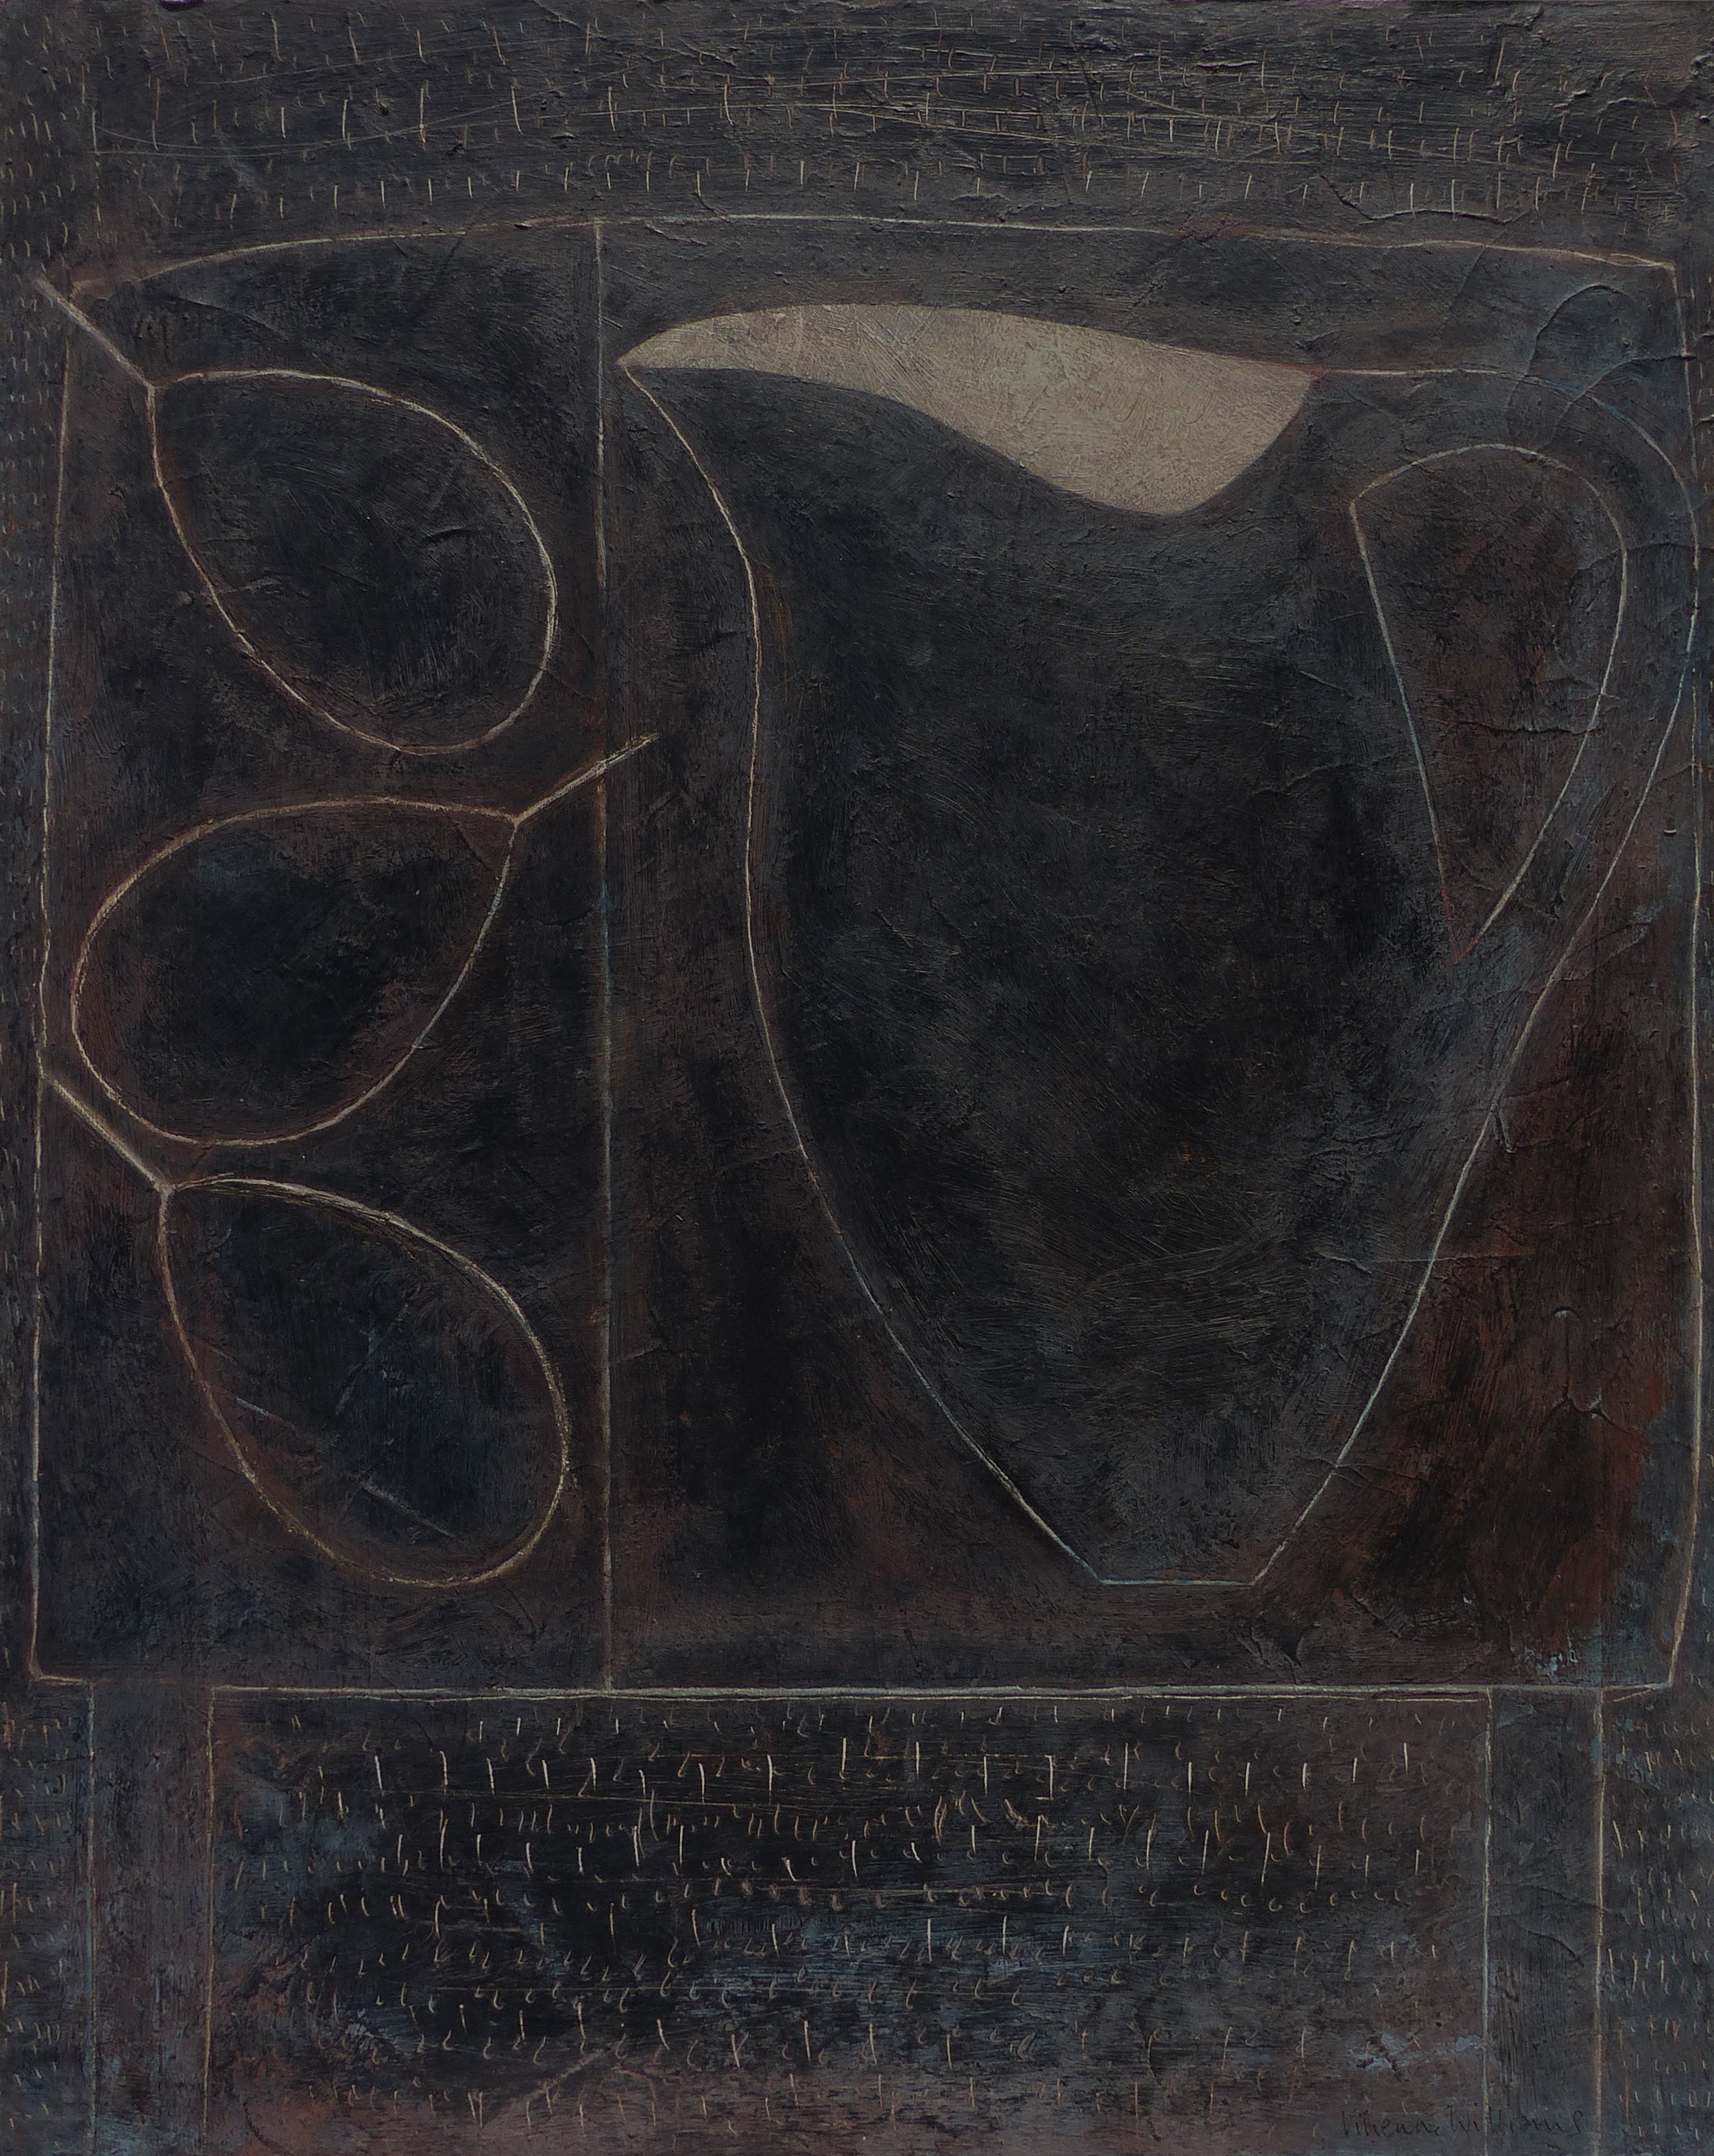 Blackboard Jug and Pears, 51cm x 41cm, 2018